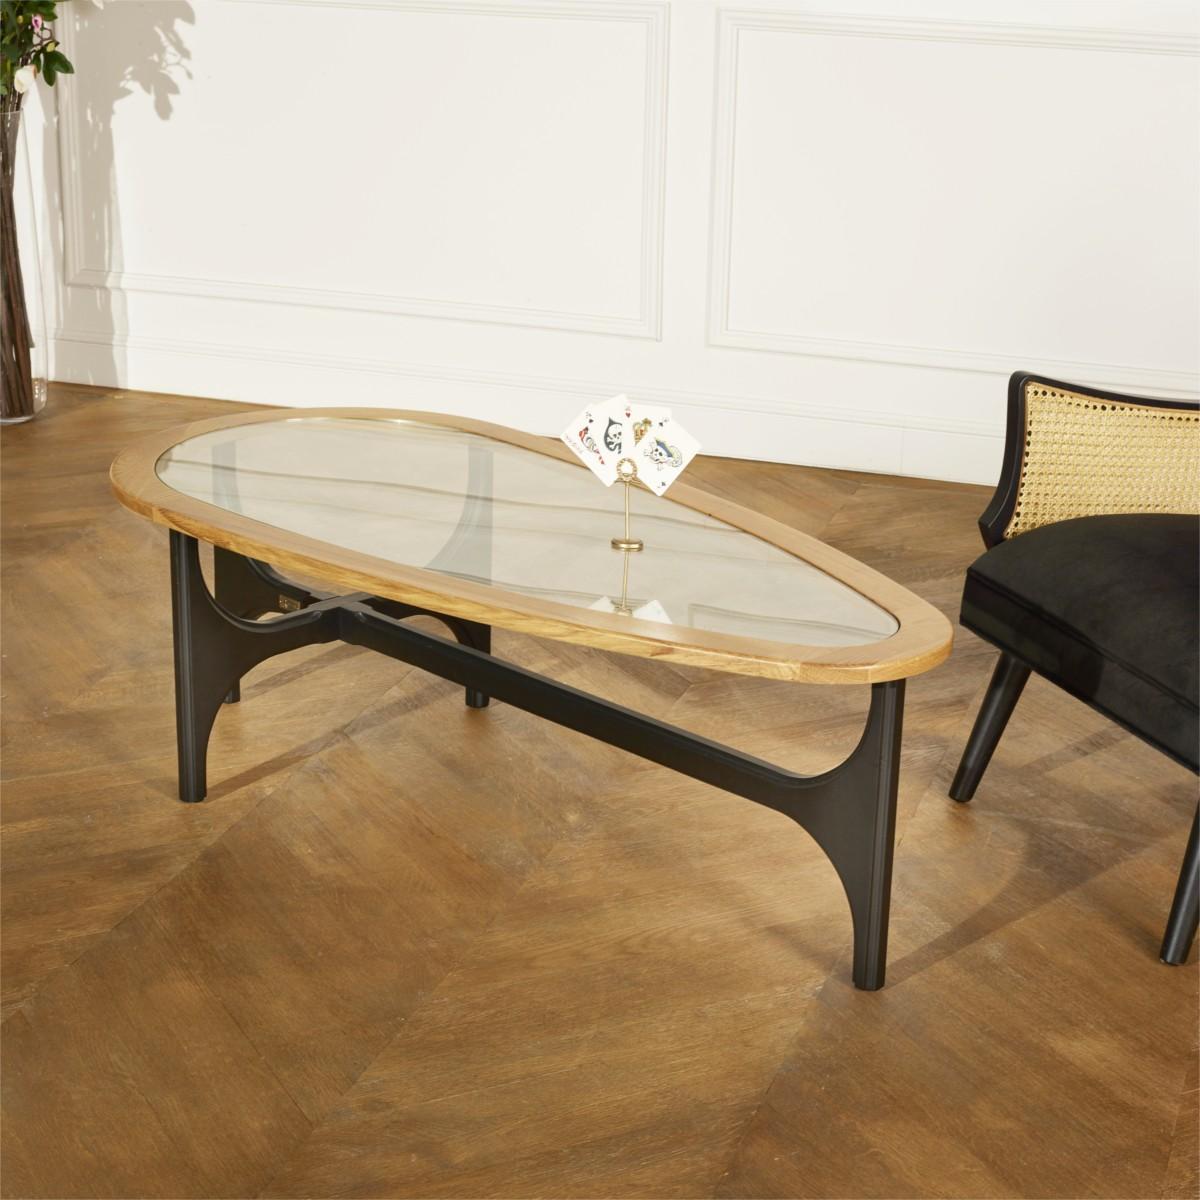 table basse bois et verre augustin